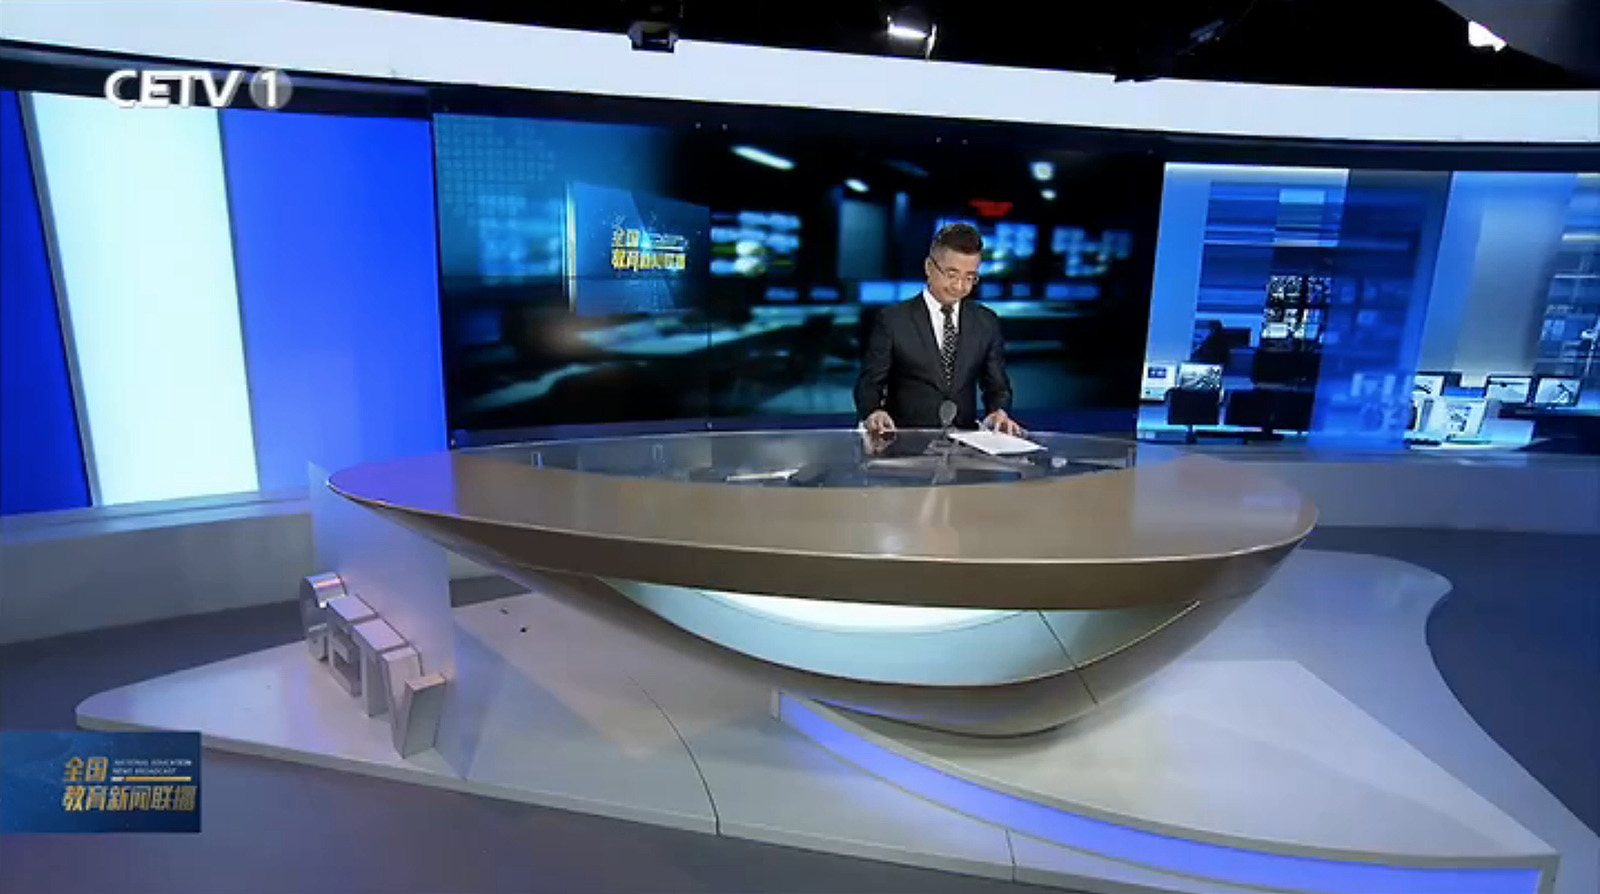 ncs_China-Education-Network-Television-Studio_0004